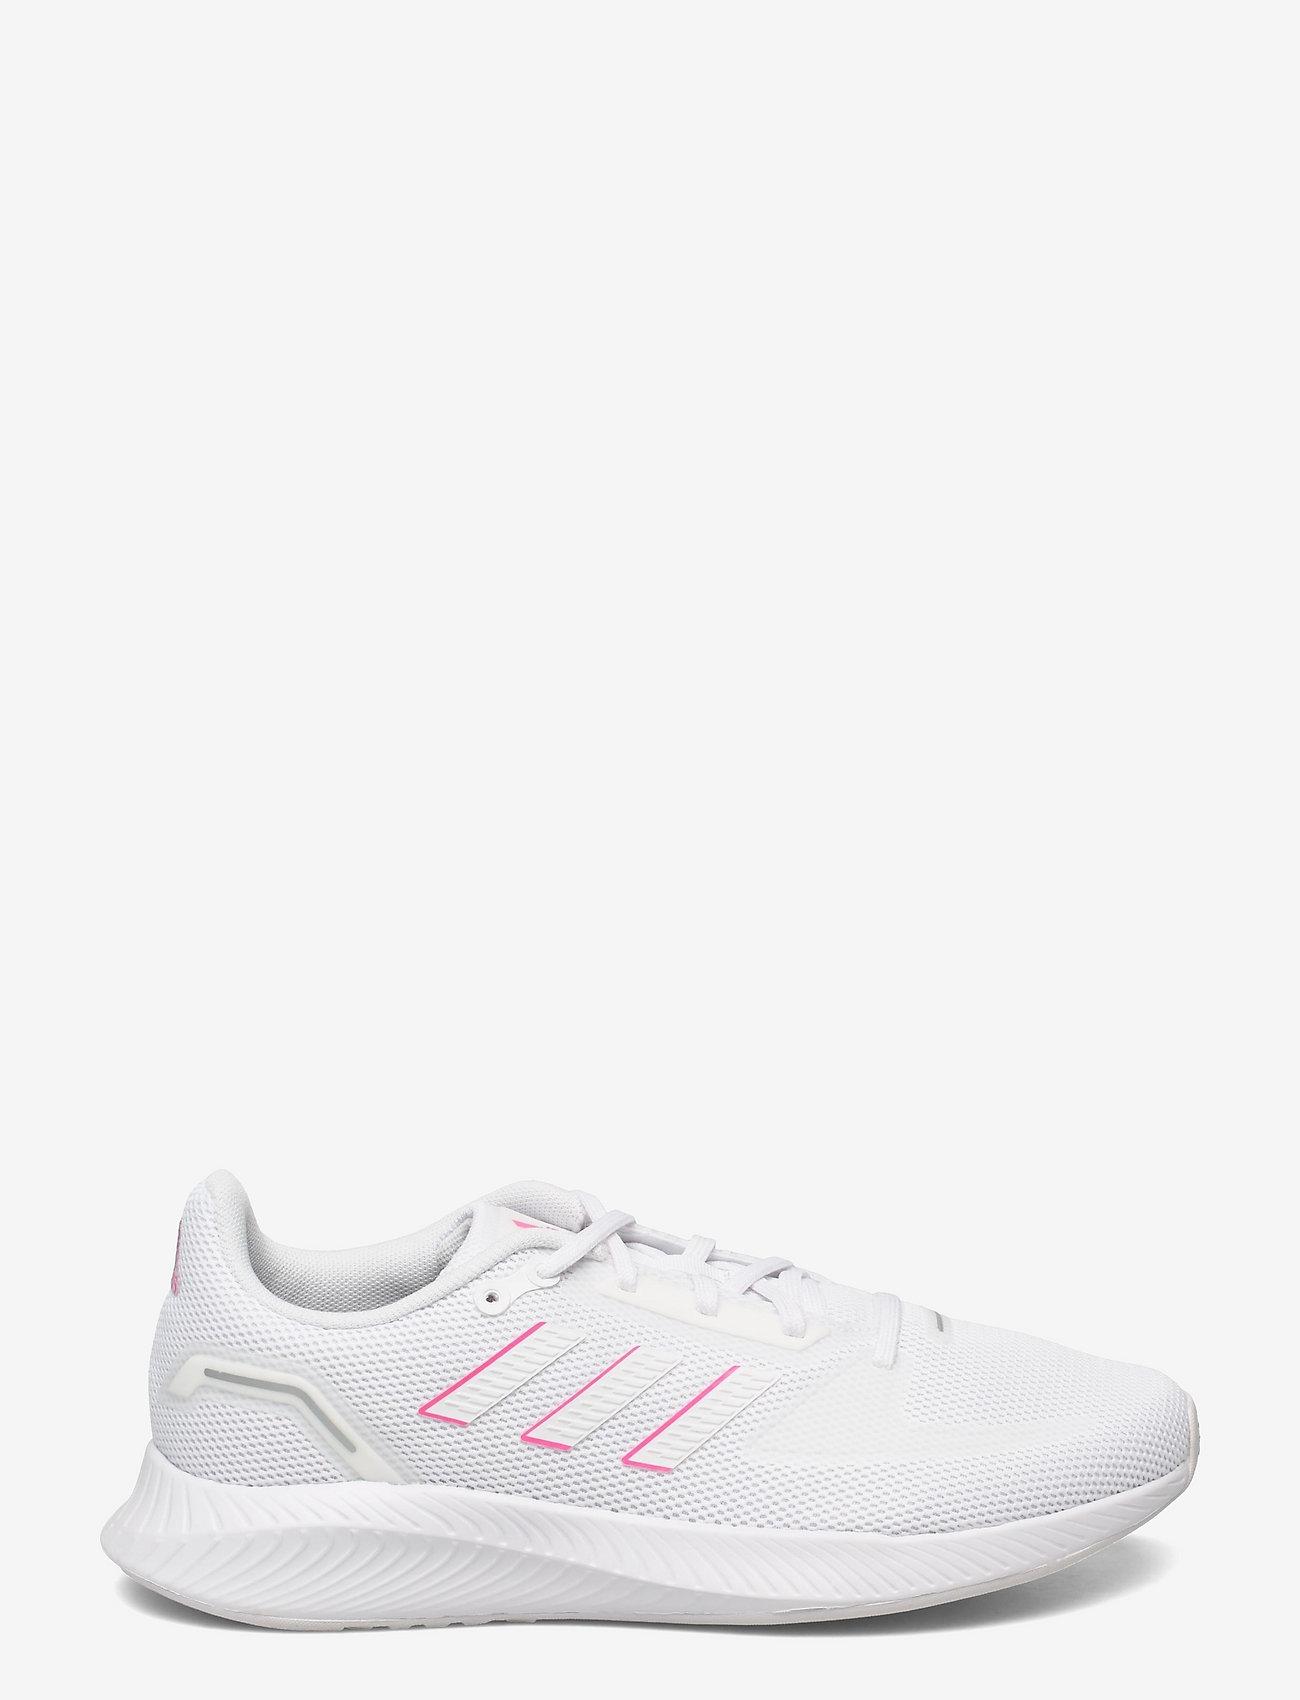 adidas Performance - Run Falcon 2.0  W - running shoes - ftwwht/ftwwht/scrpnk - 1